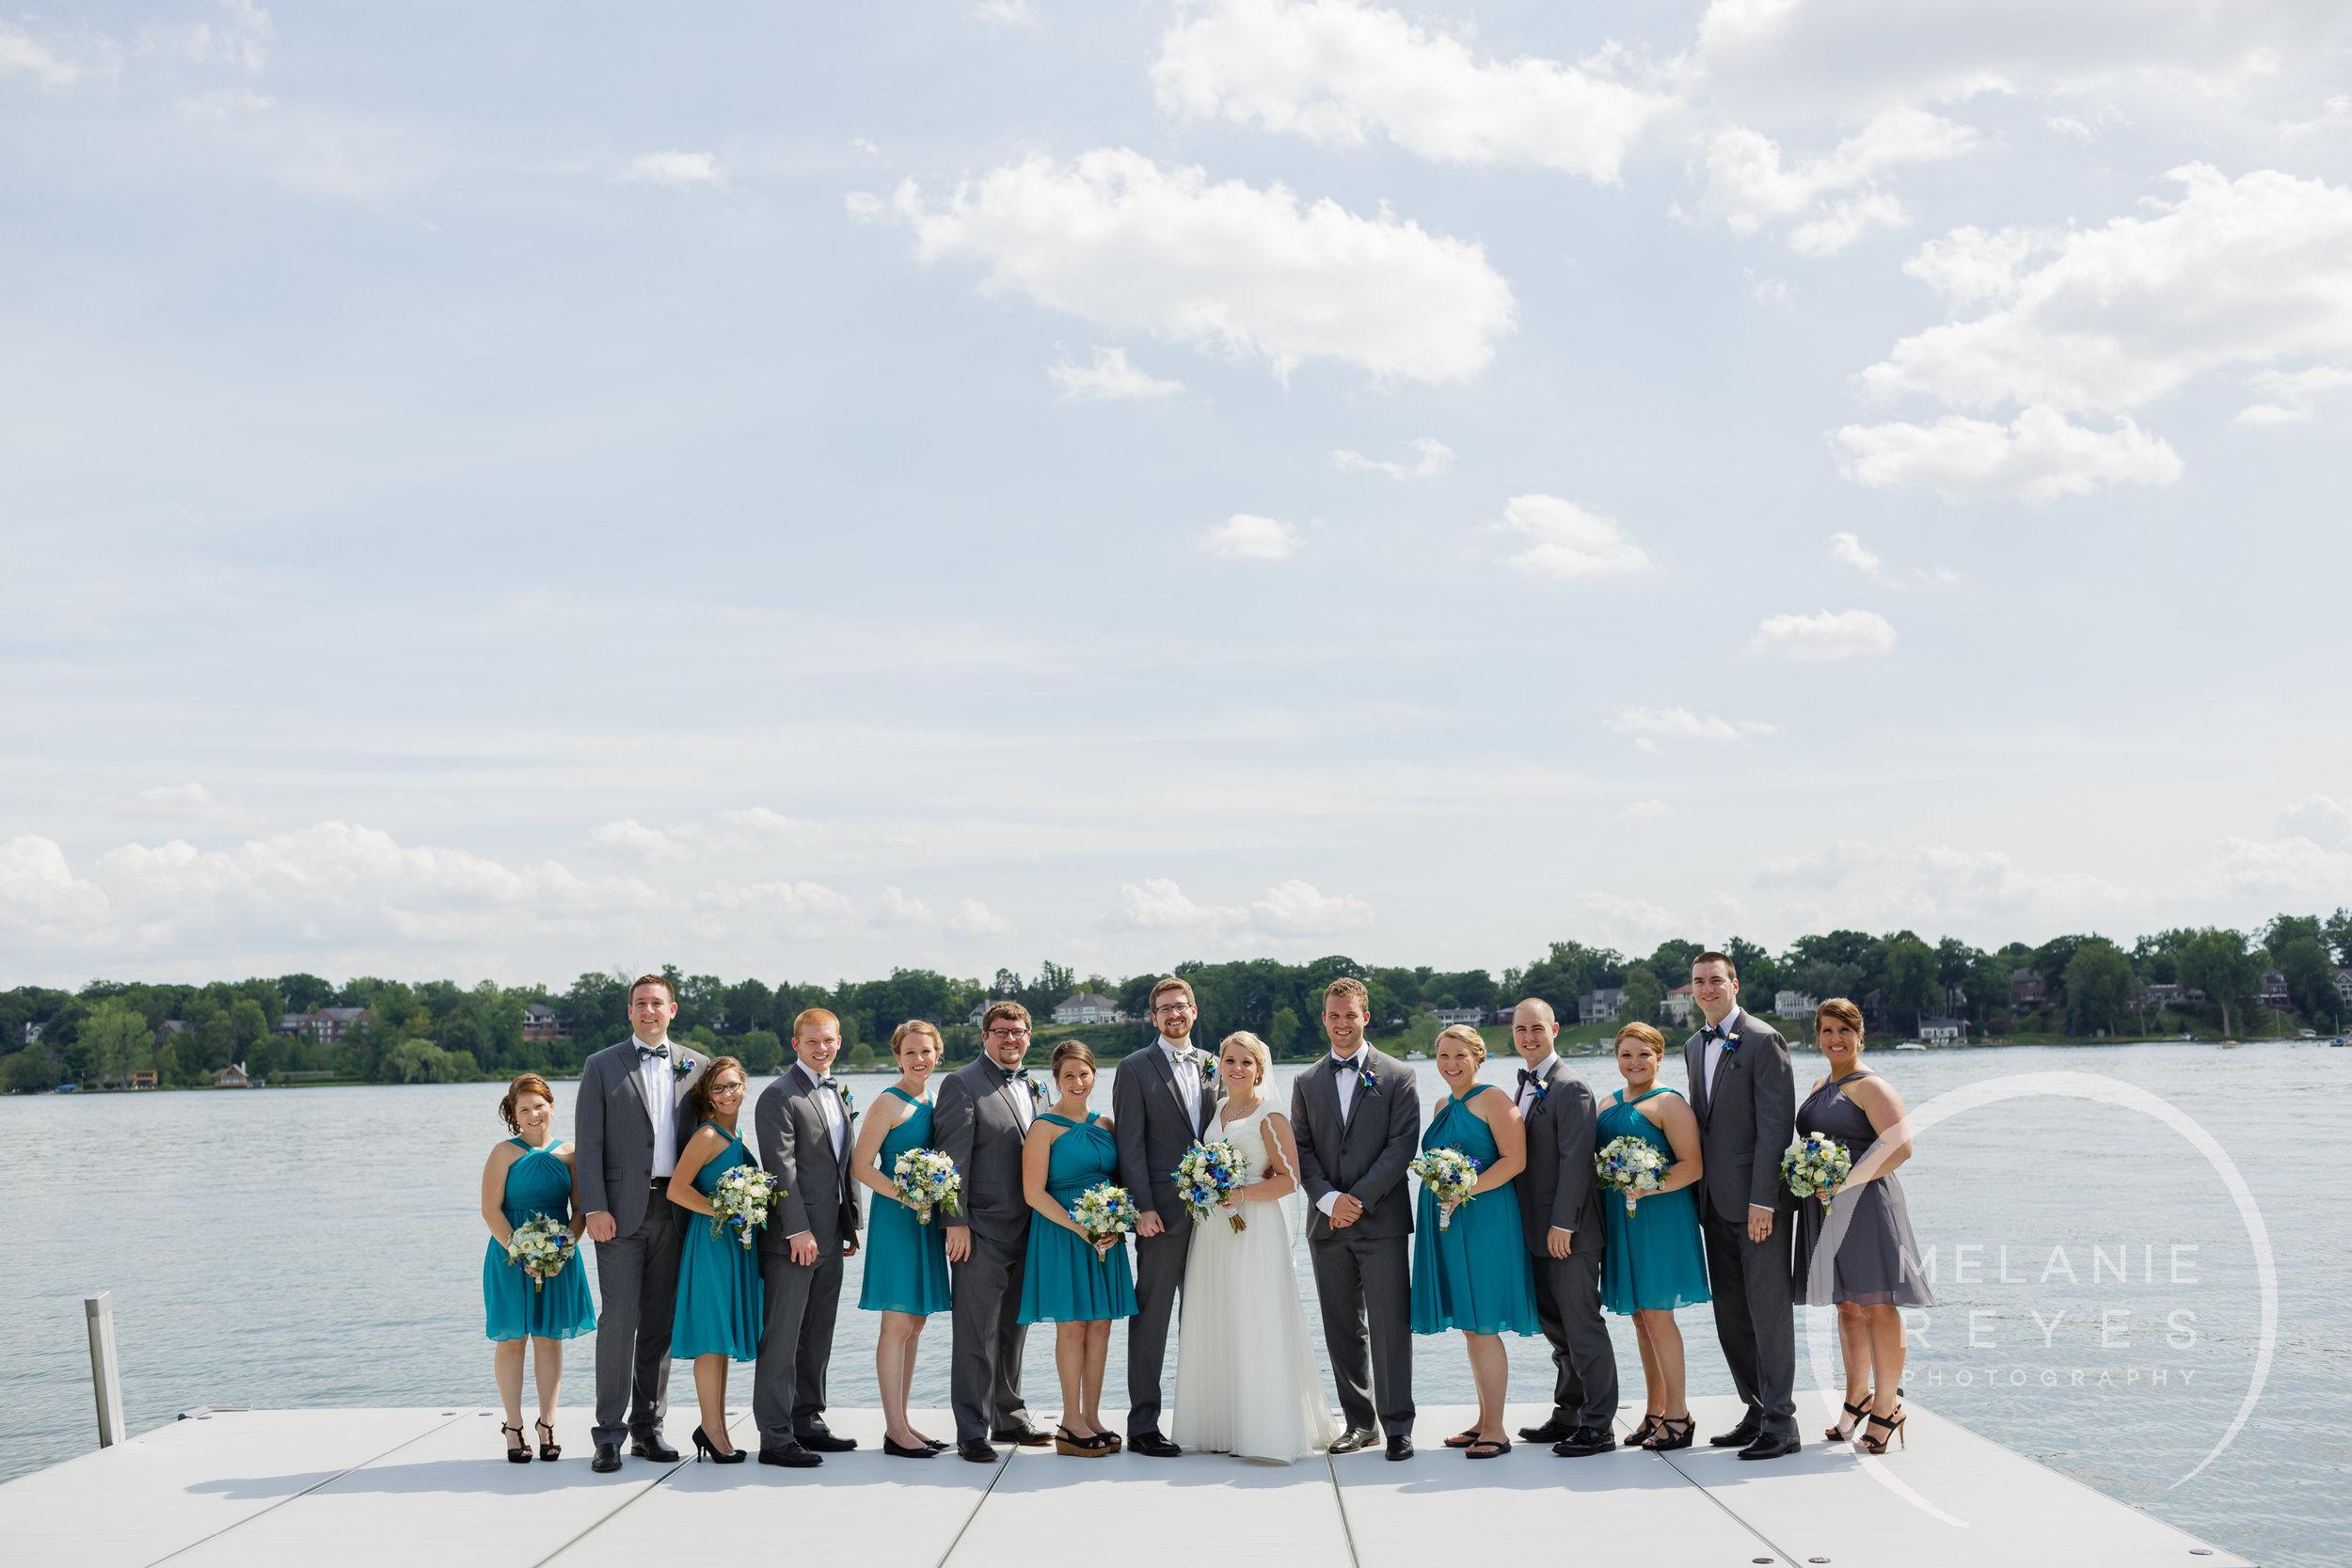 048_grandrapids_wedding_photographer_melaniereyes.JPG